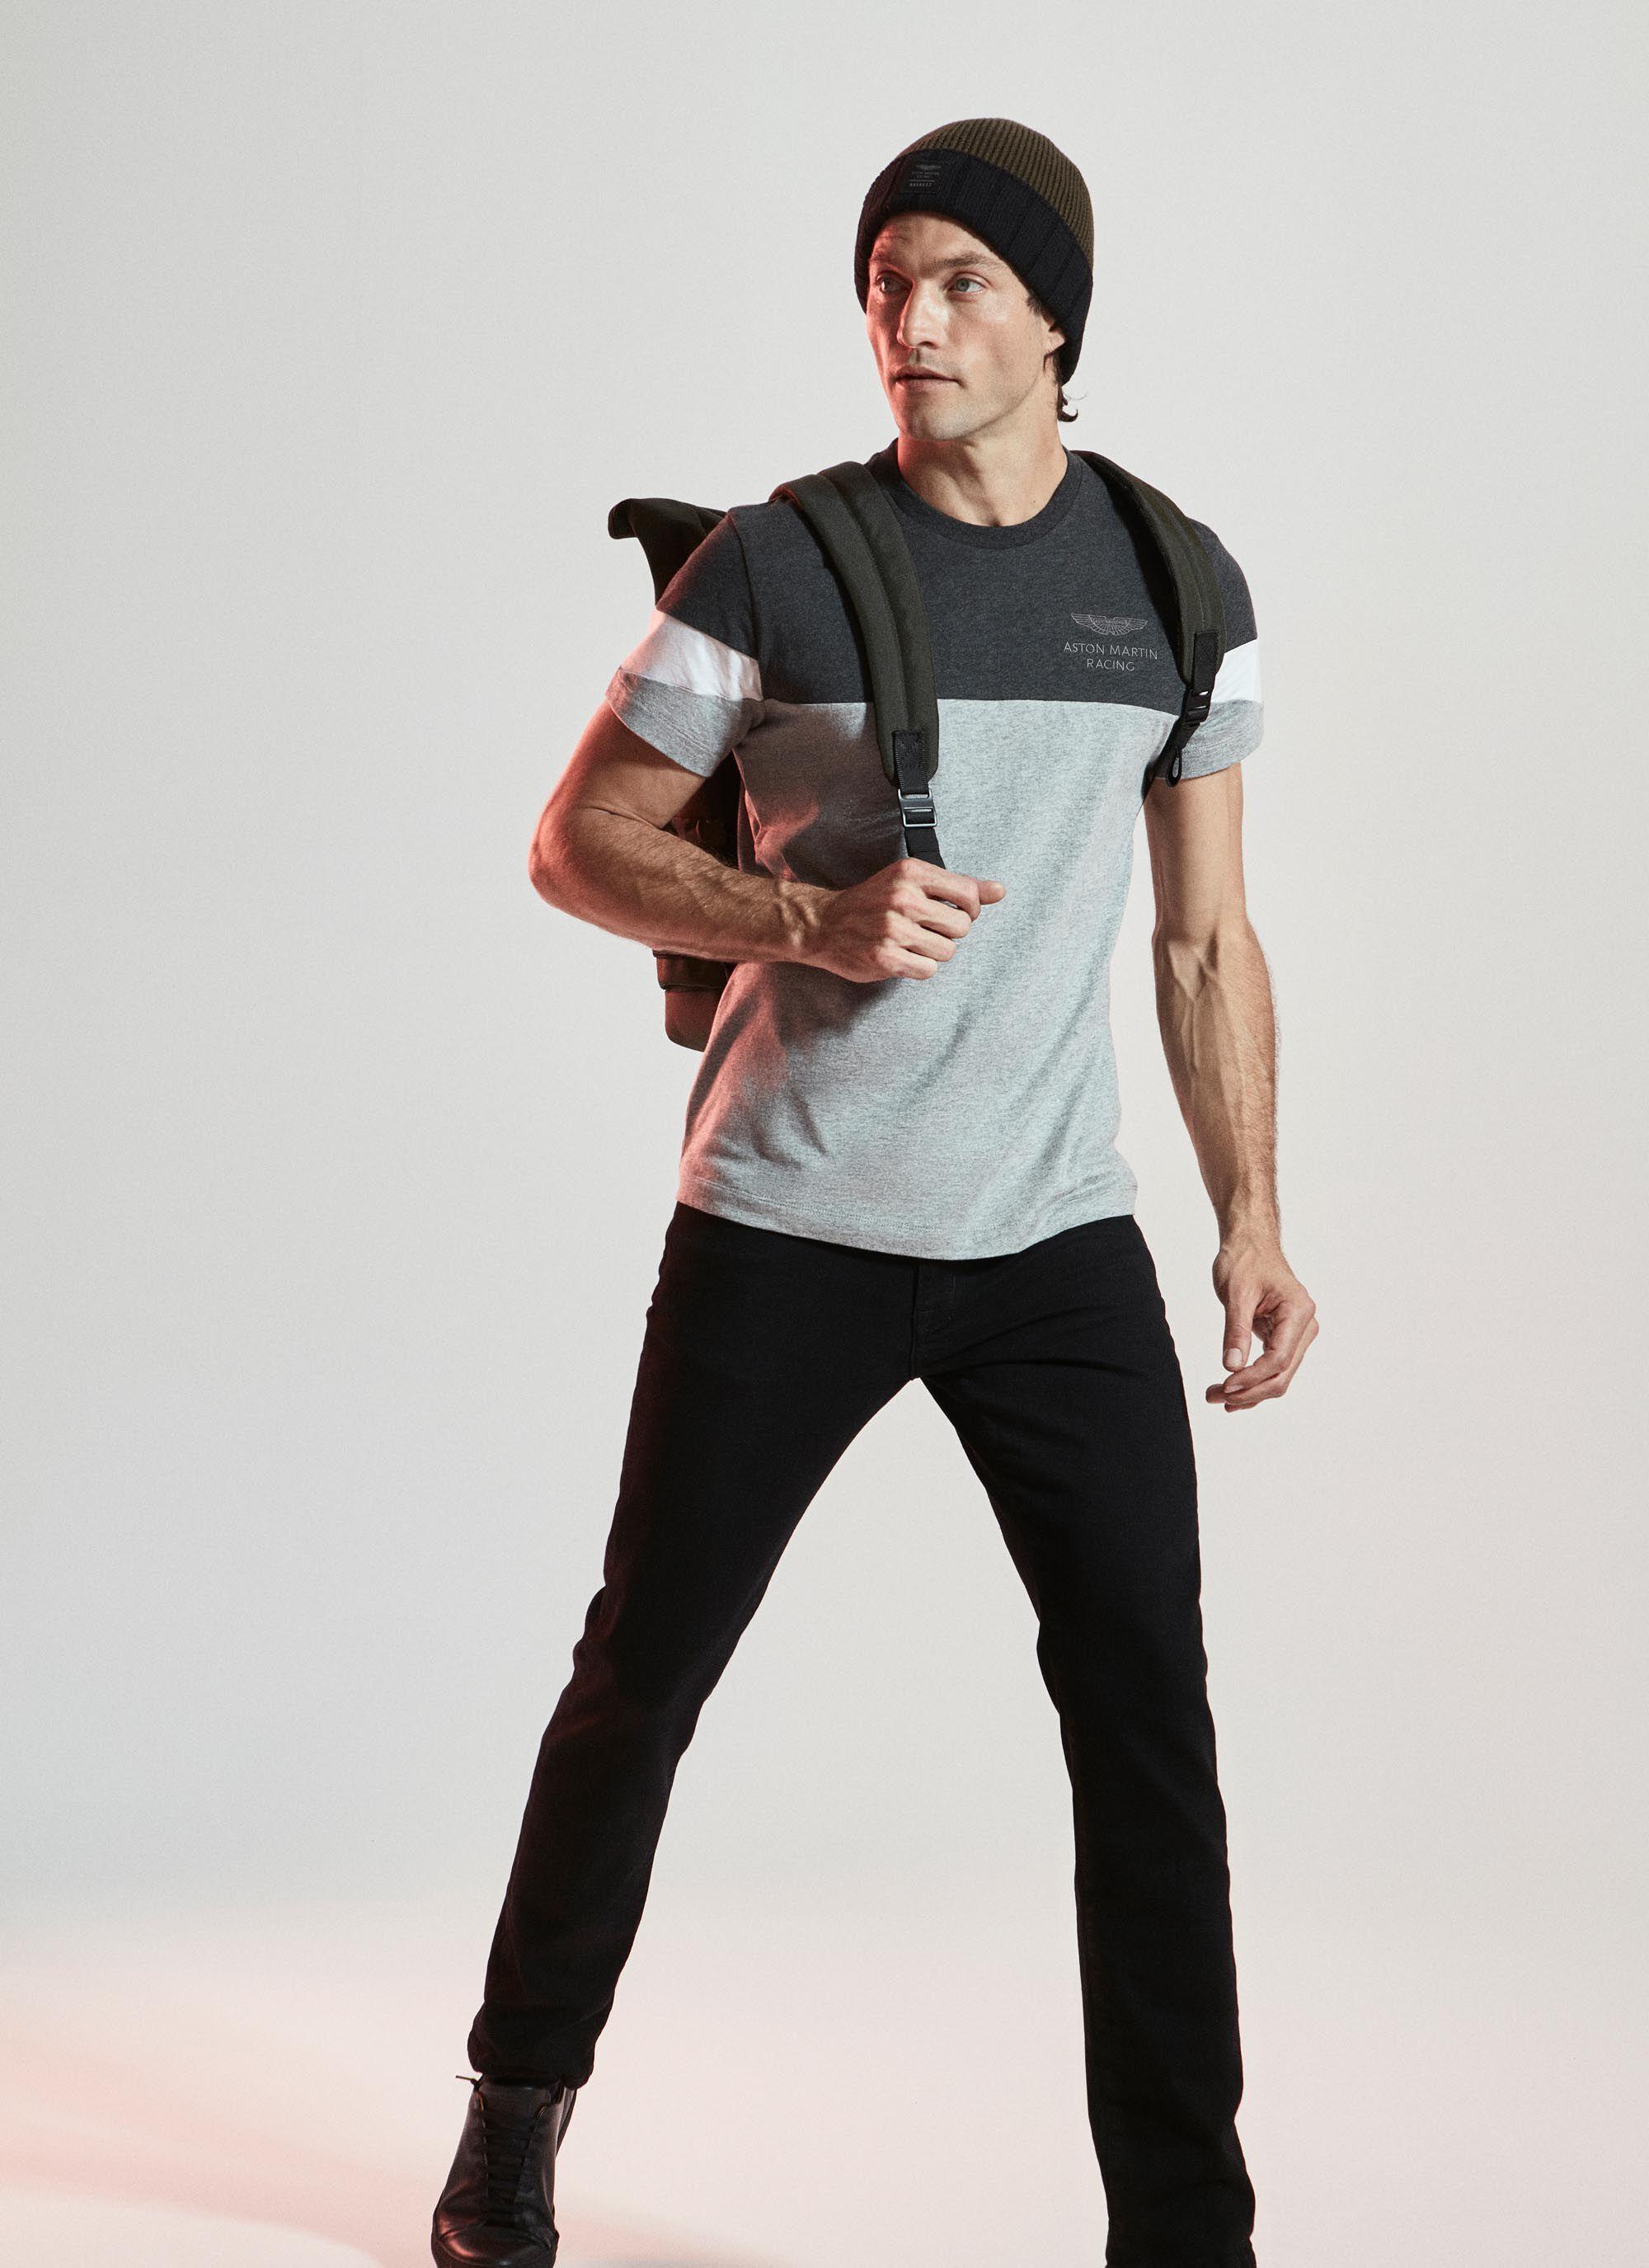 aston martin racing men's sleeve stripe detail cotton jersey t-shirt | large | charcoal/grey